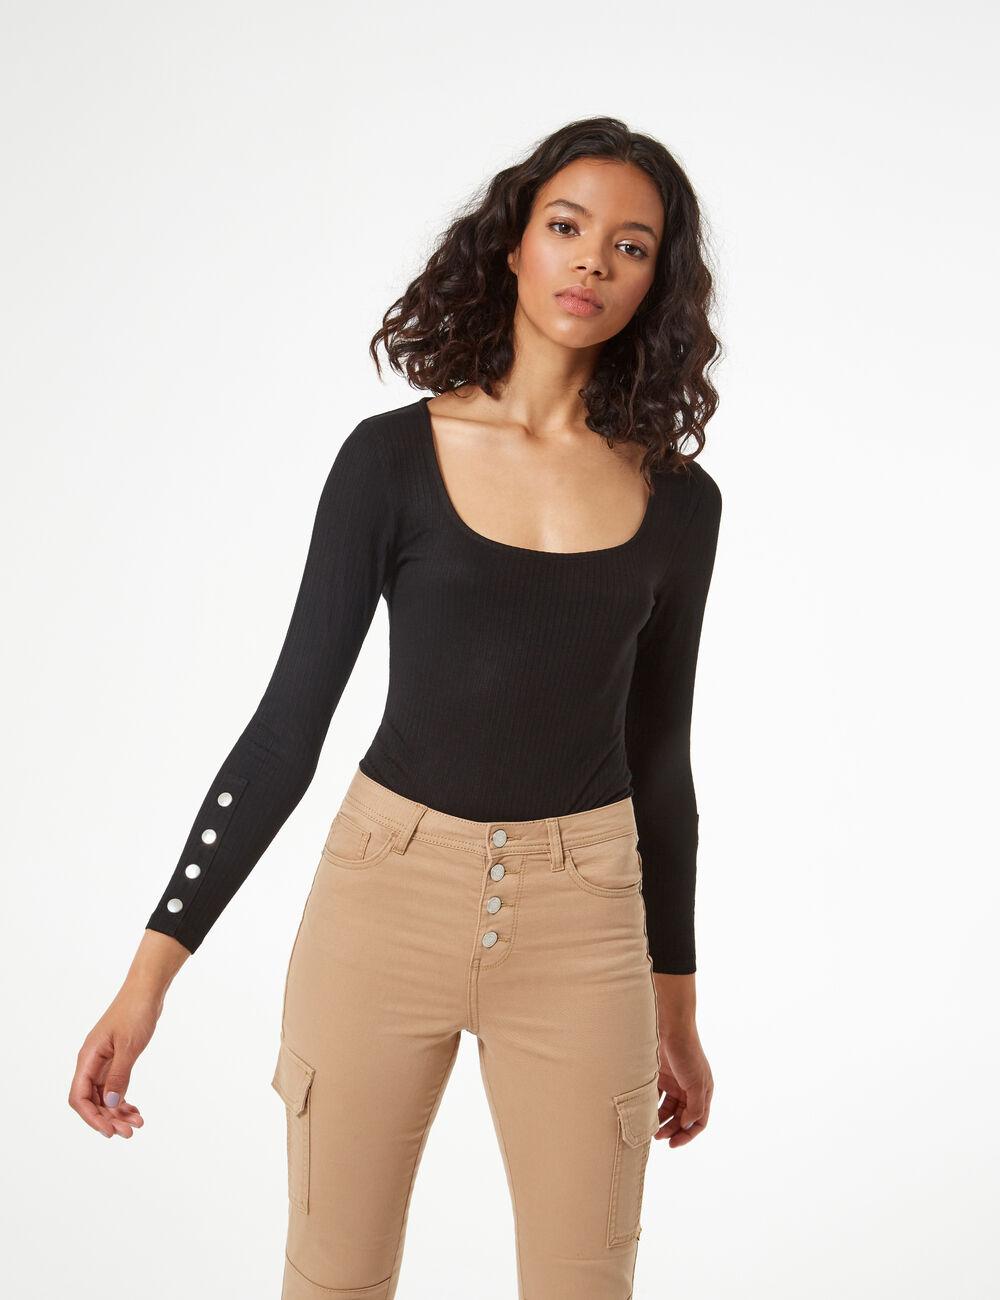 Jennyfer Collection • Femme Nouvelle Vêtements Yb6fyv7g